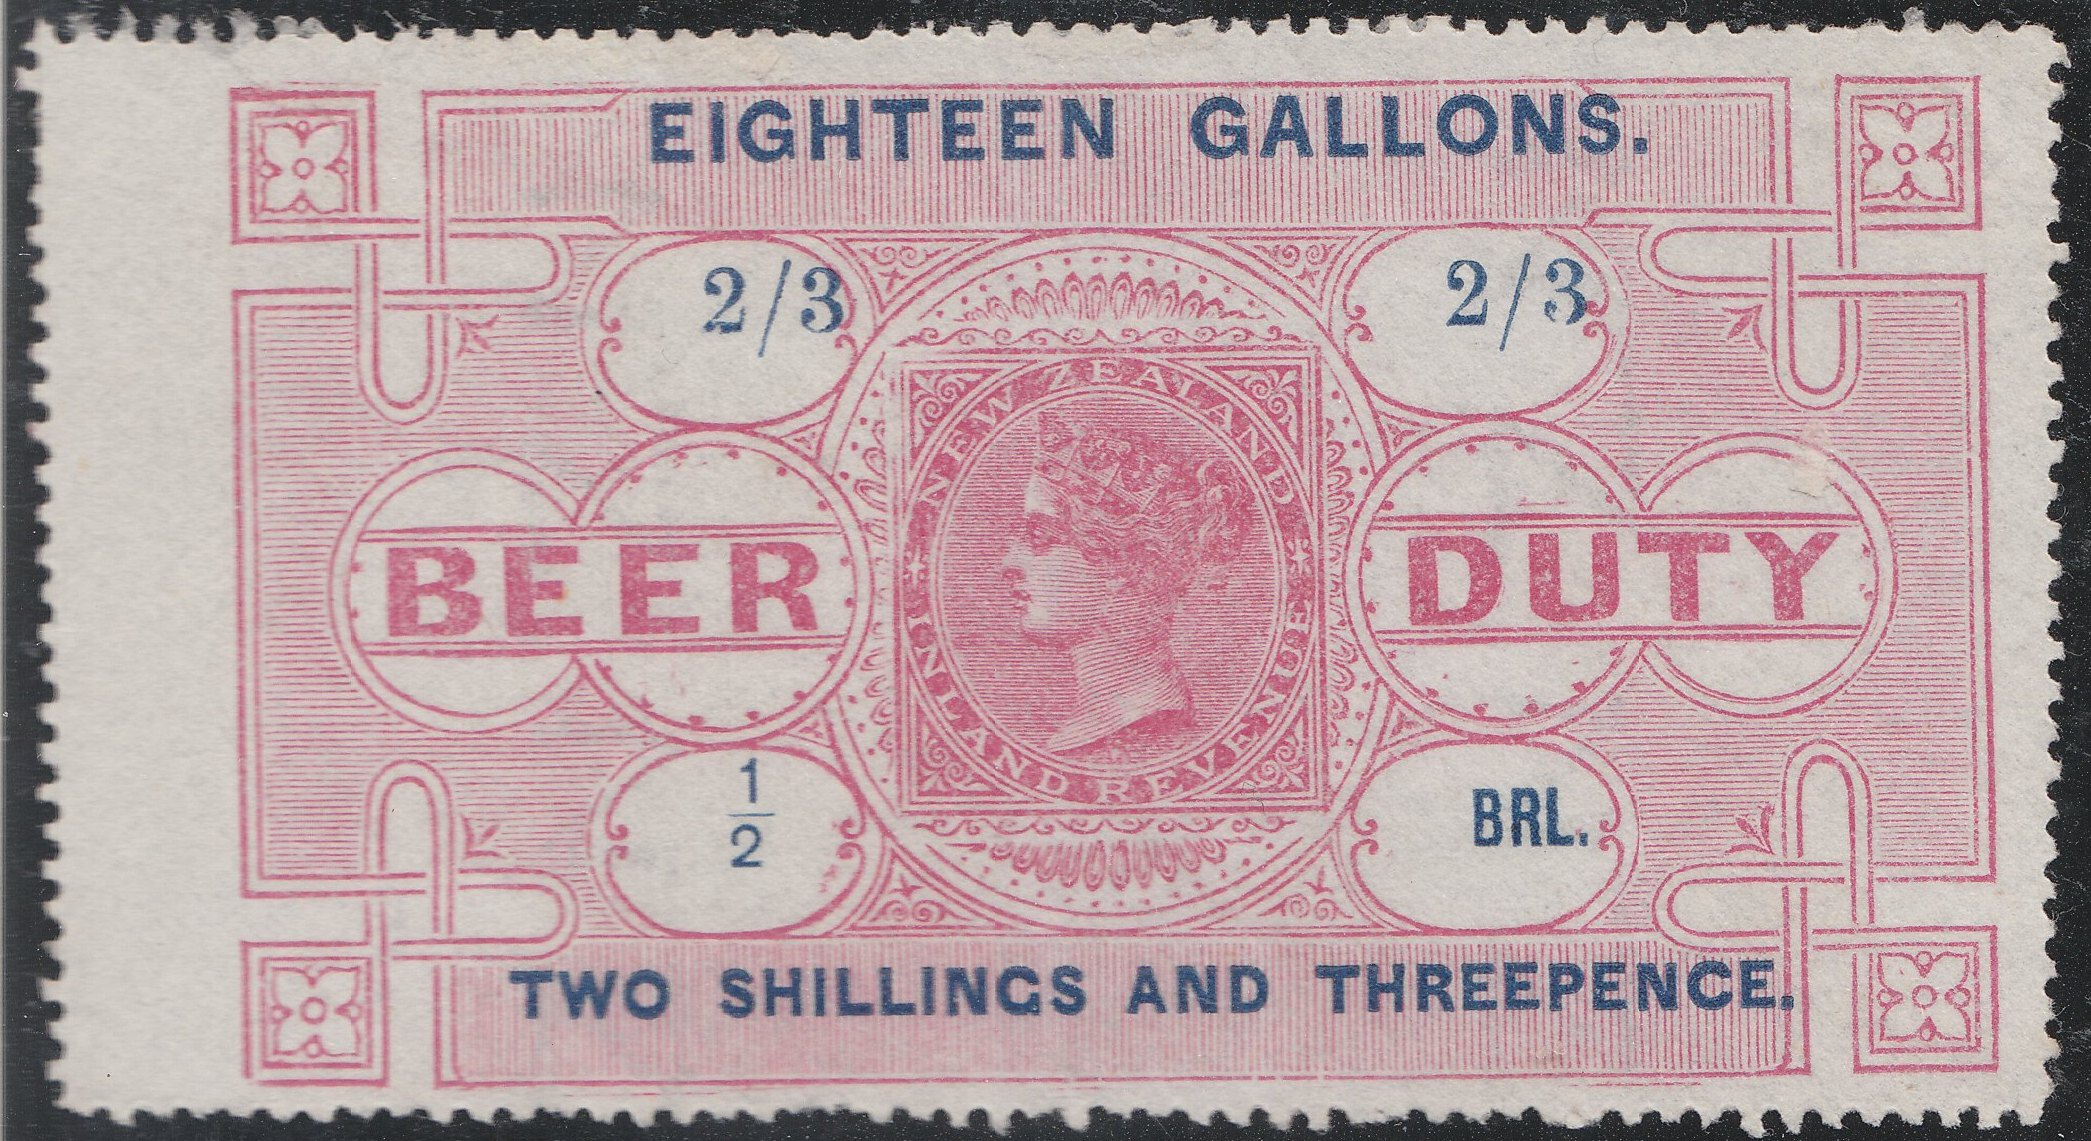 Beer Duty - 1878 2/3 Rose & Blue